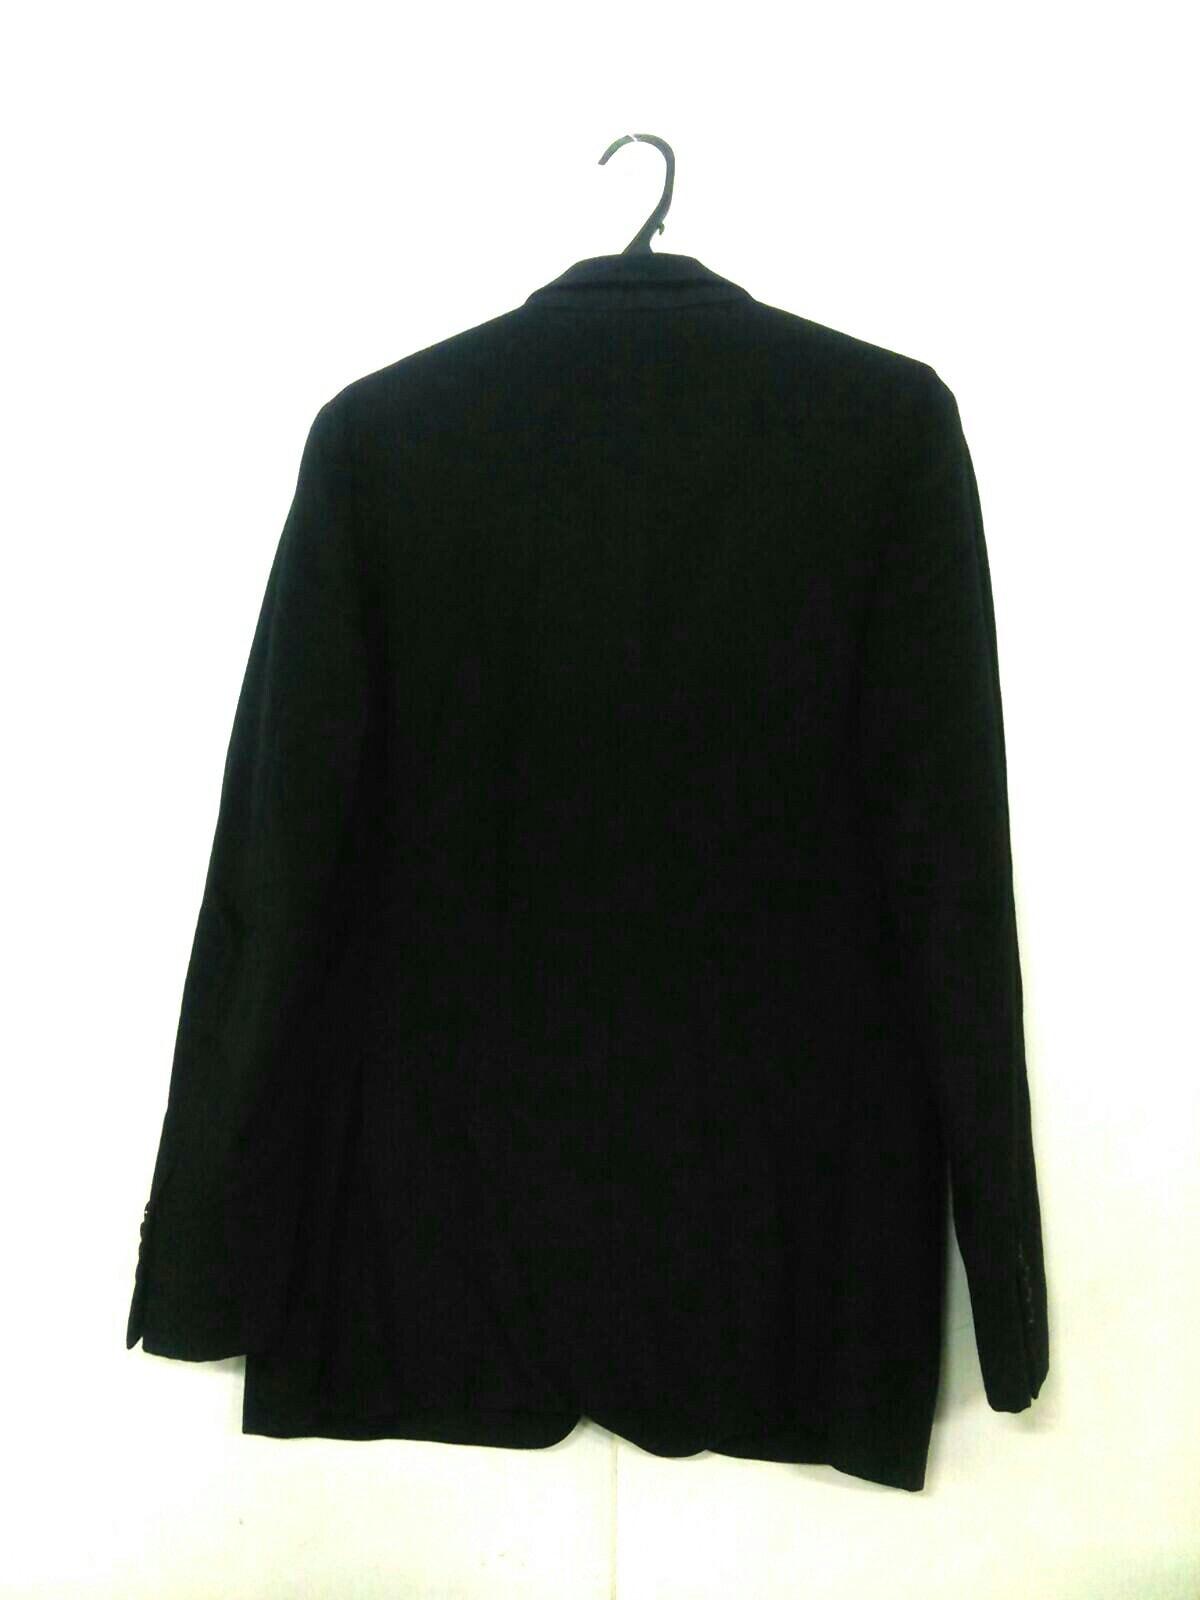 Zegna(ゼニア)のジャケット